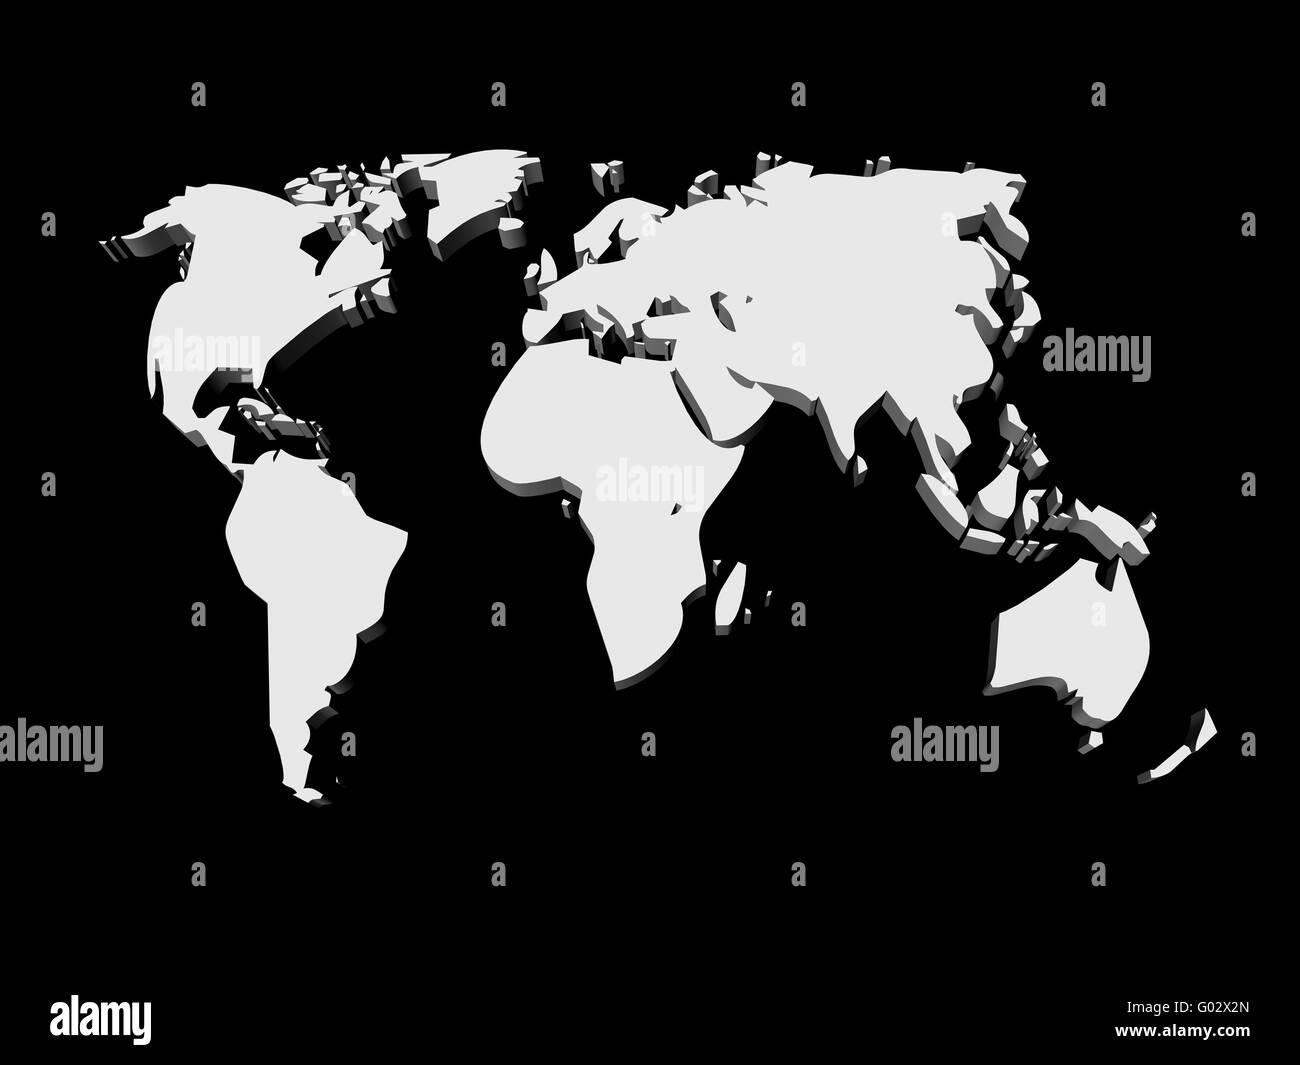 World map stock photo 103326573 alamy world map world map stock photo gumiabroncs Choice Image